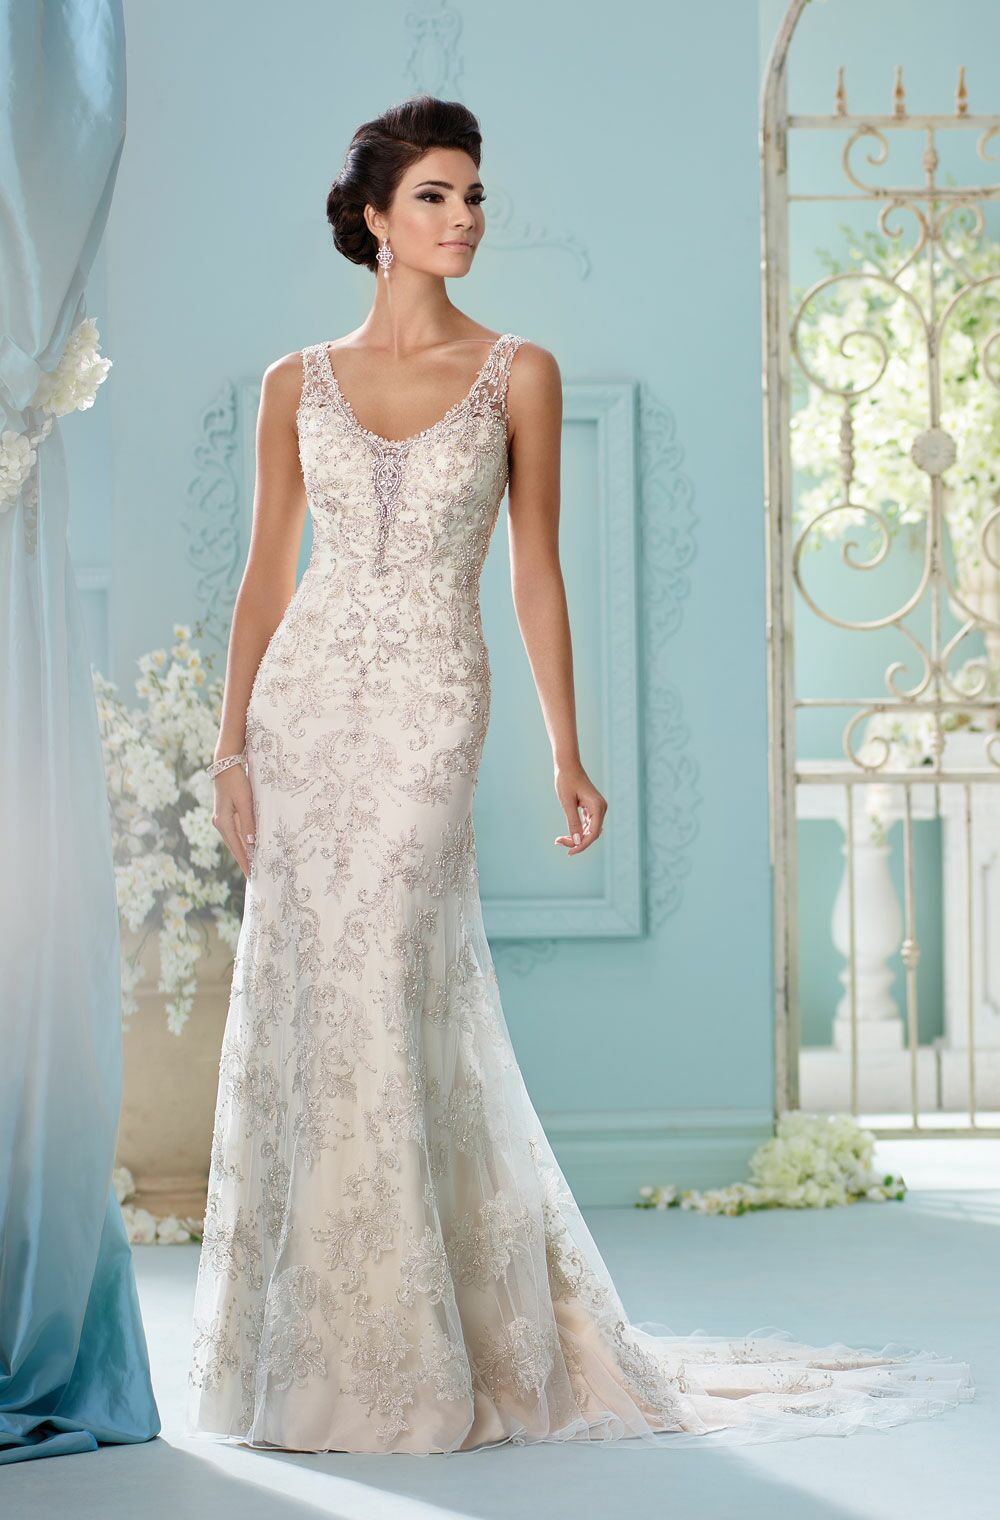 David Tutera Spring 2017 Collection: Bridal Fashion Week Photos